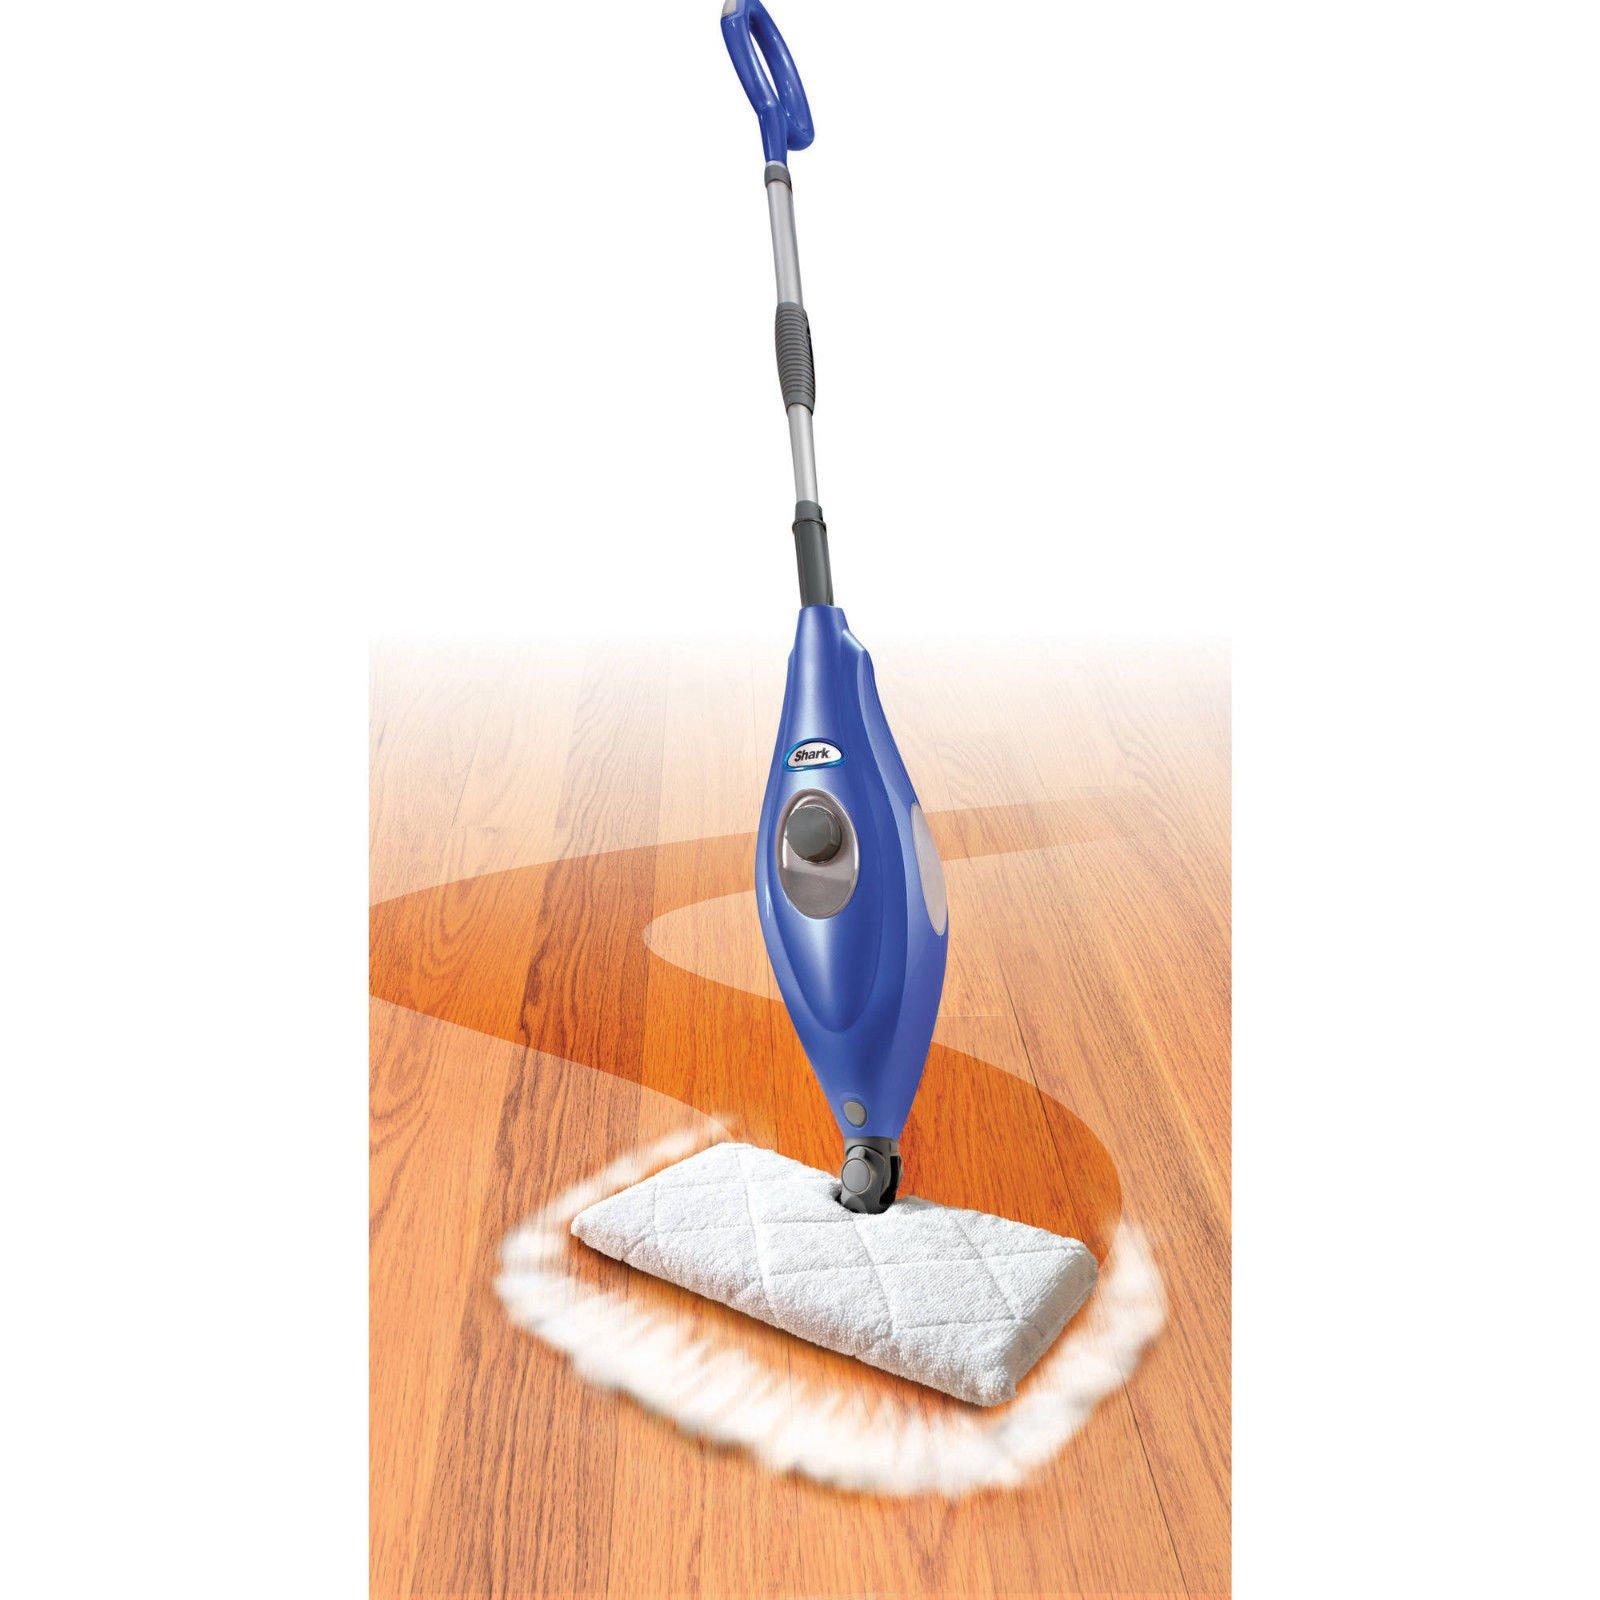 shark floor steam cleaner manual